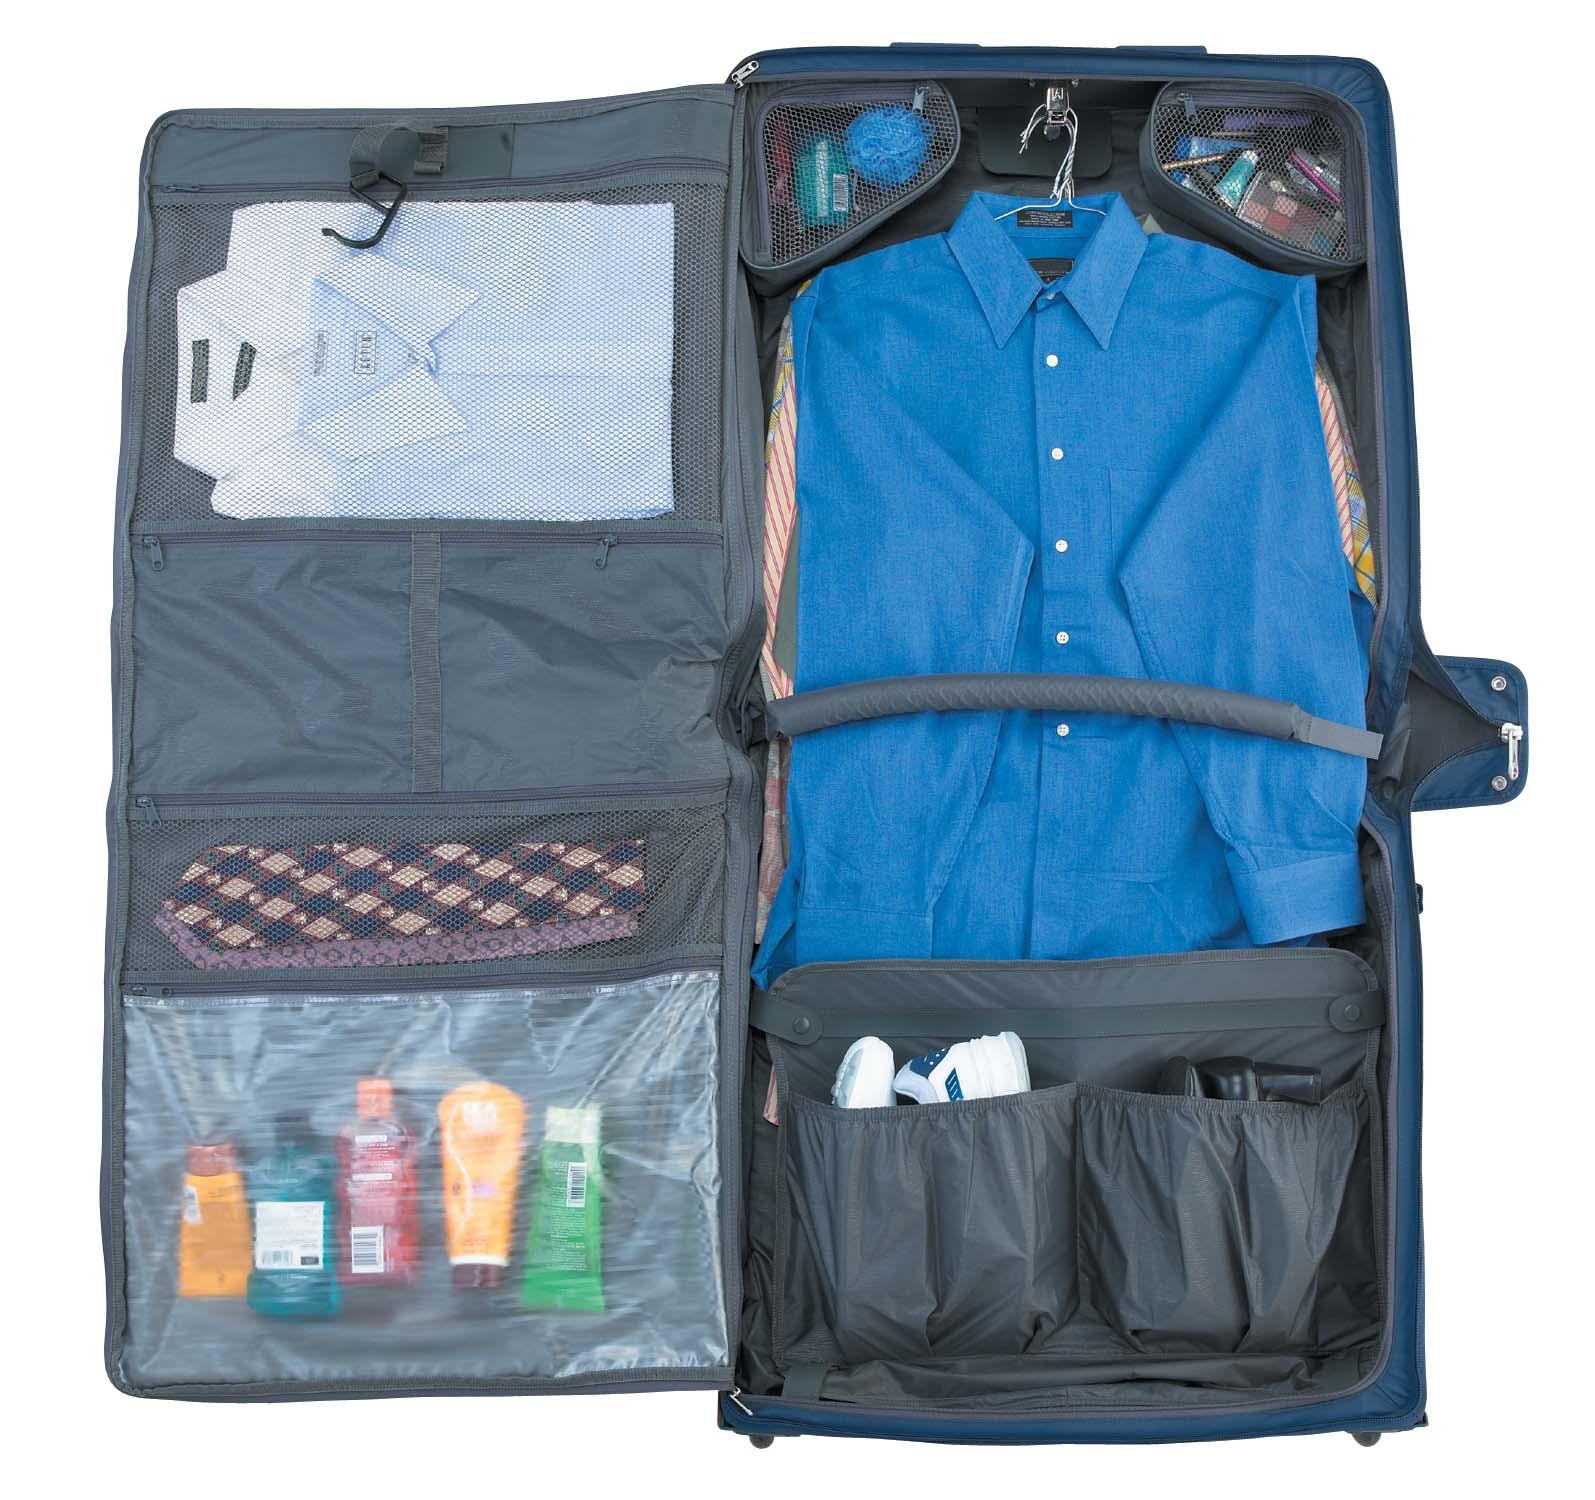 Travel Luggage Garment Bags 14